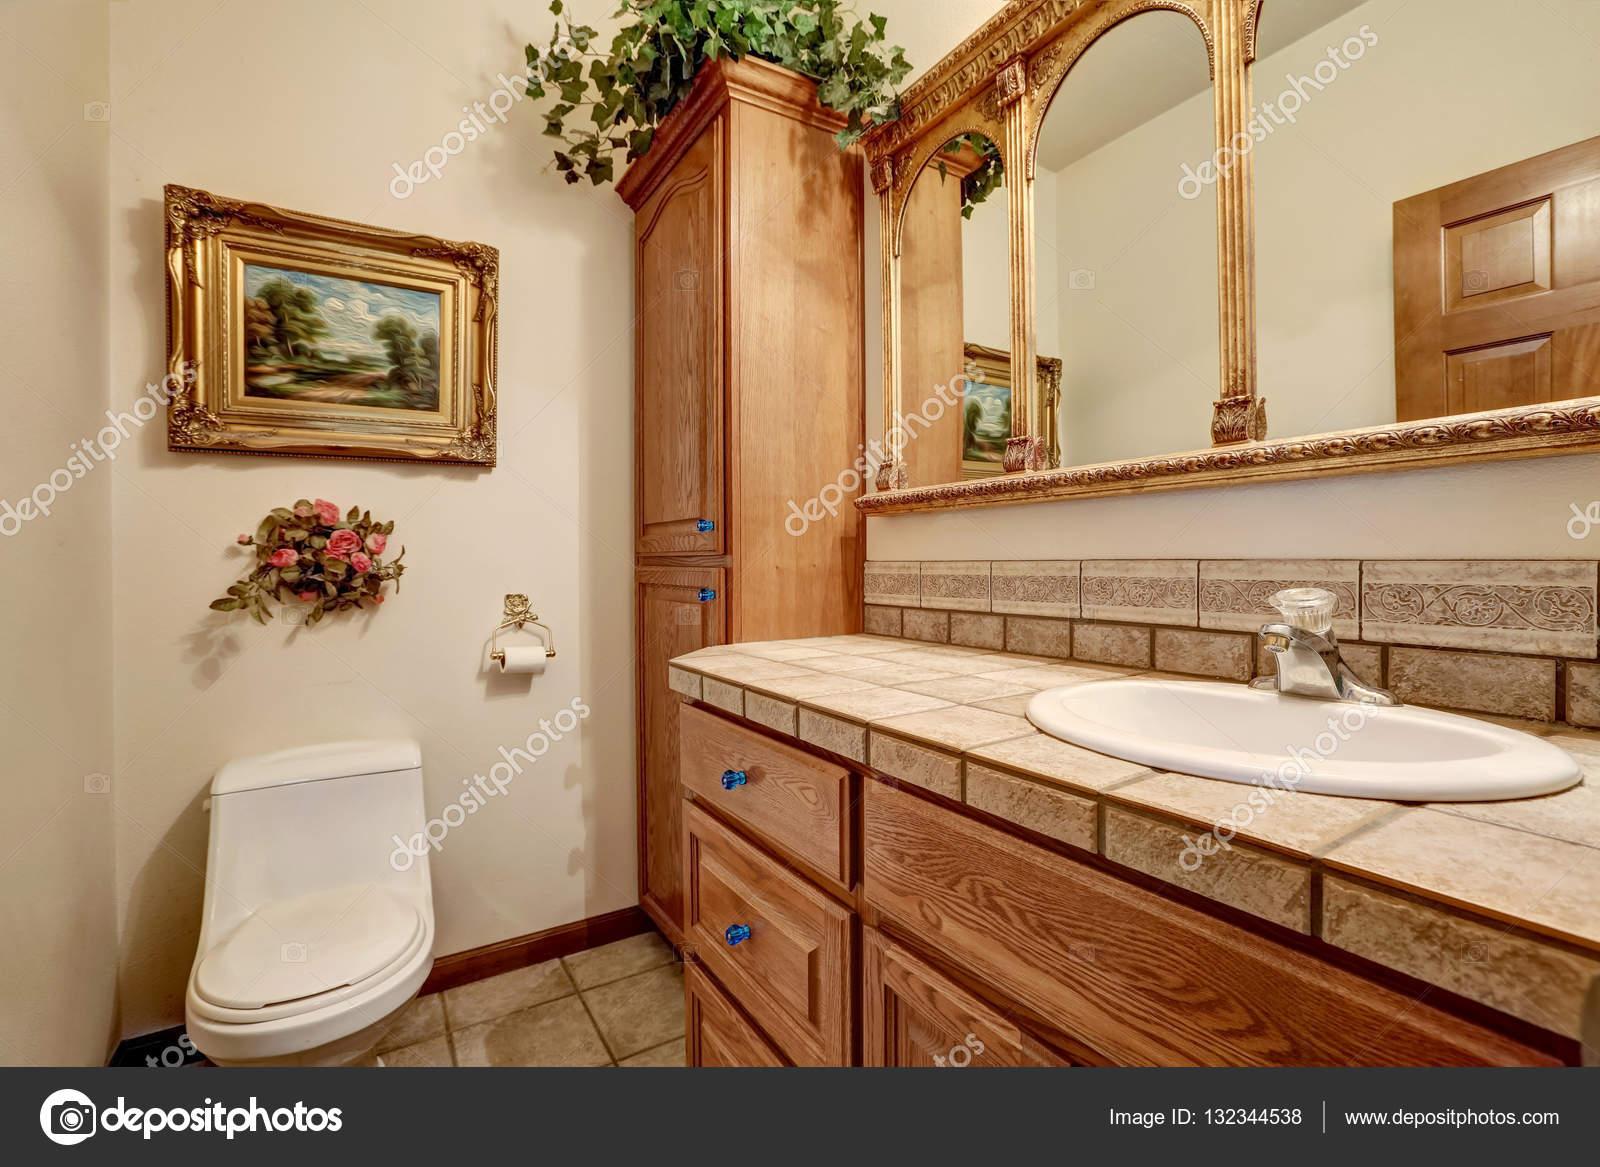 Vintage Badkamer Spiegel : Badkamersijdelheid kabinet met vintage stijl spiegel u2014 stockfoto